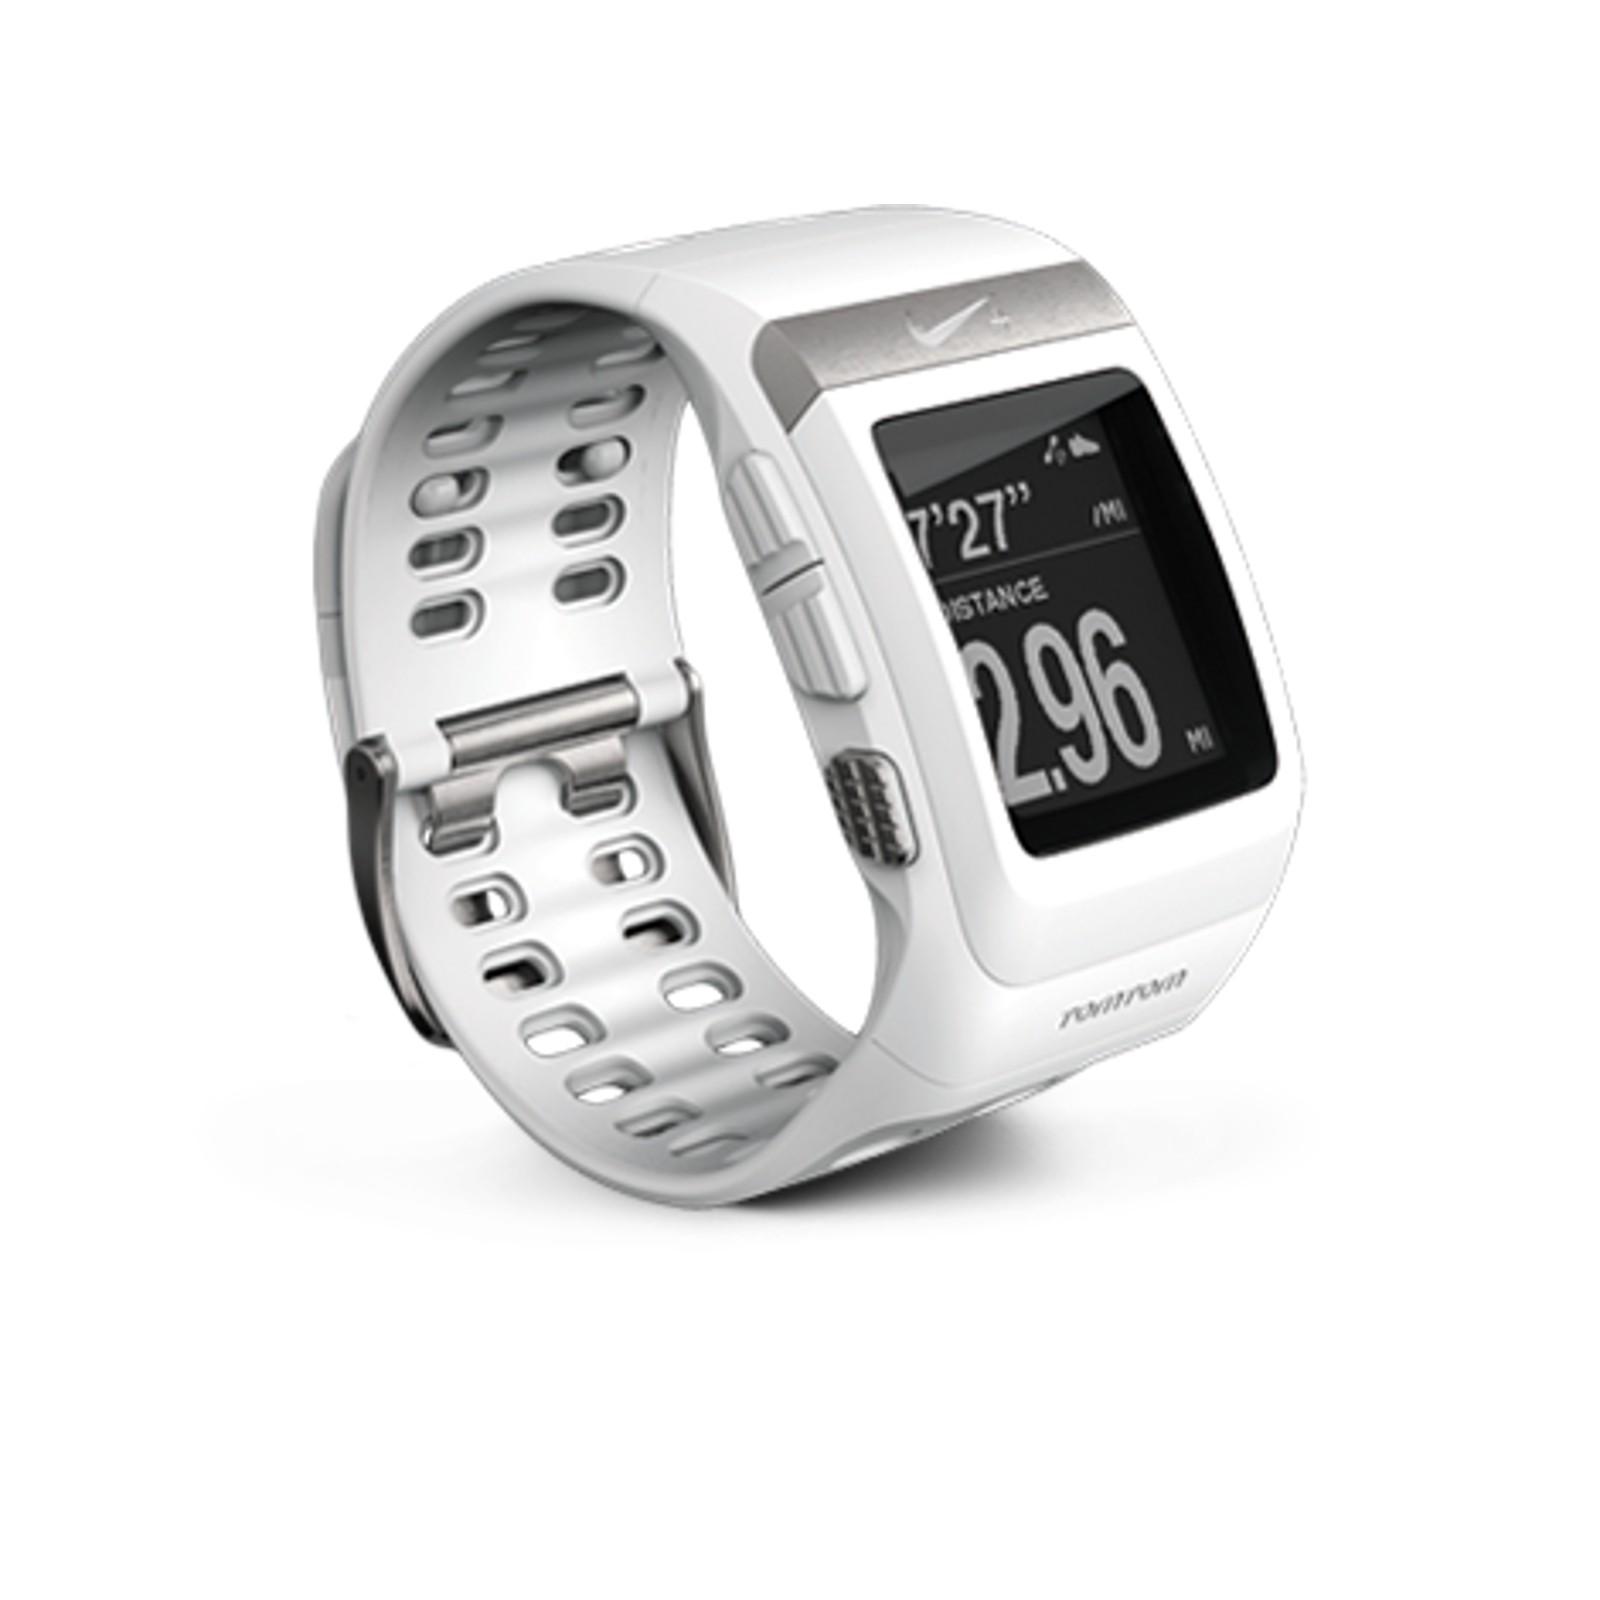 Nike Watches - GPS, Sports, Plus, Running, New, Used   eBay